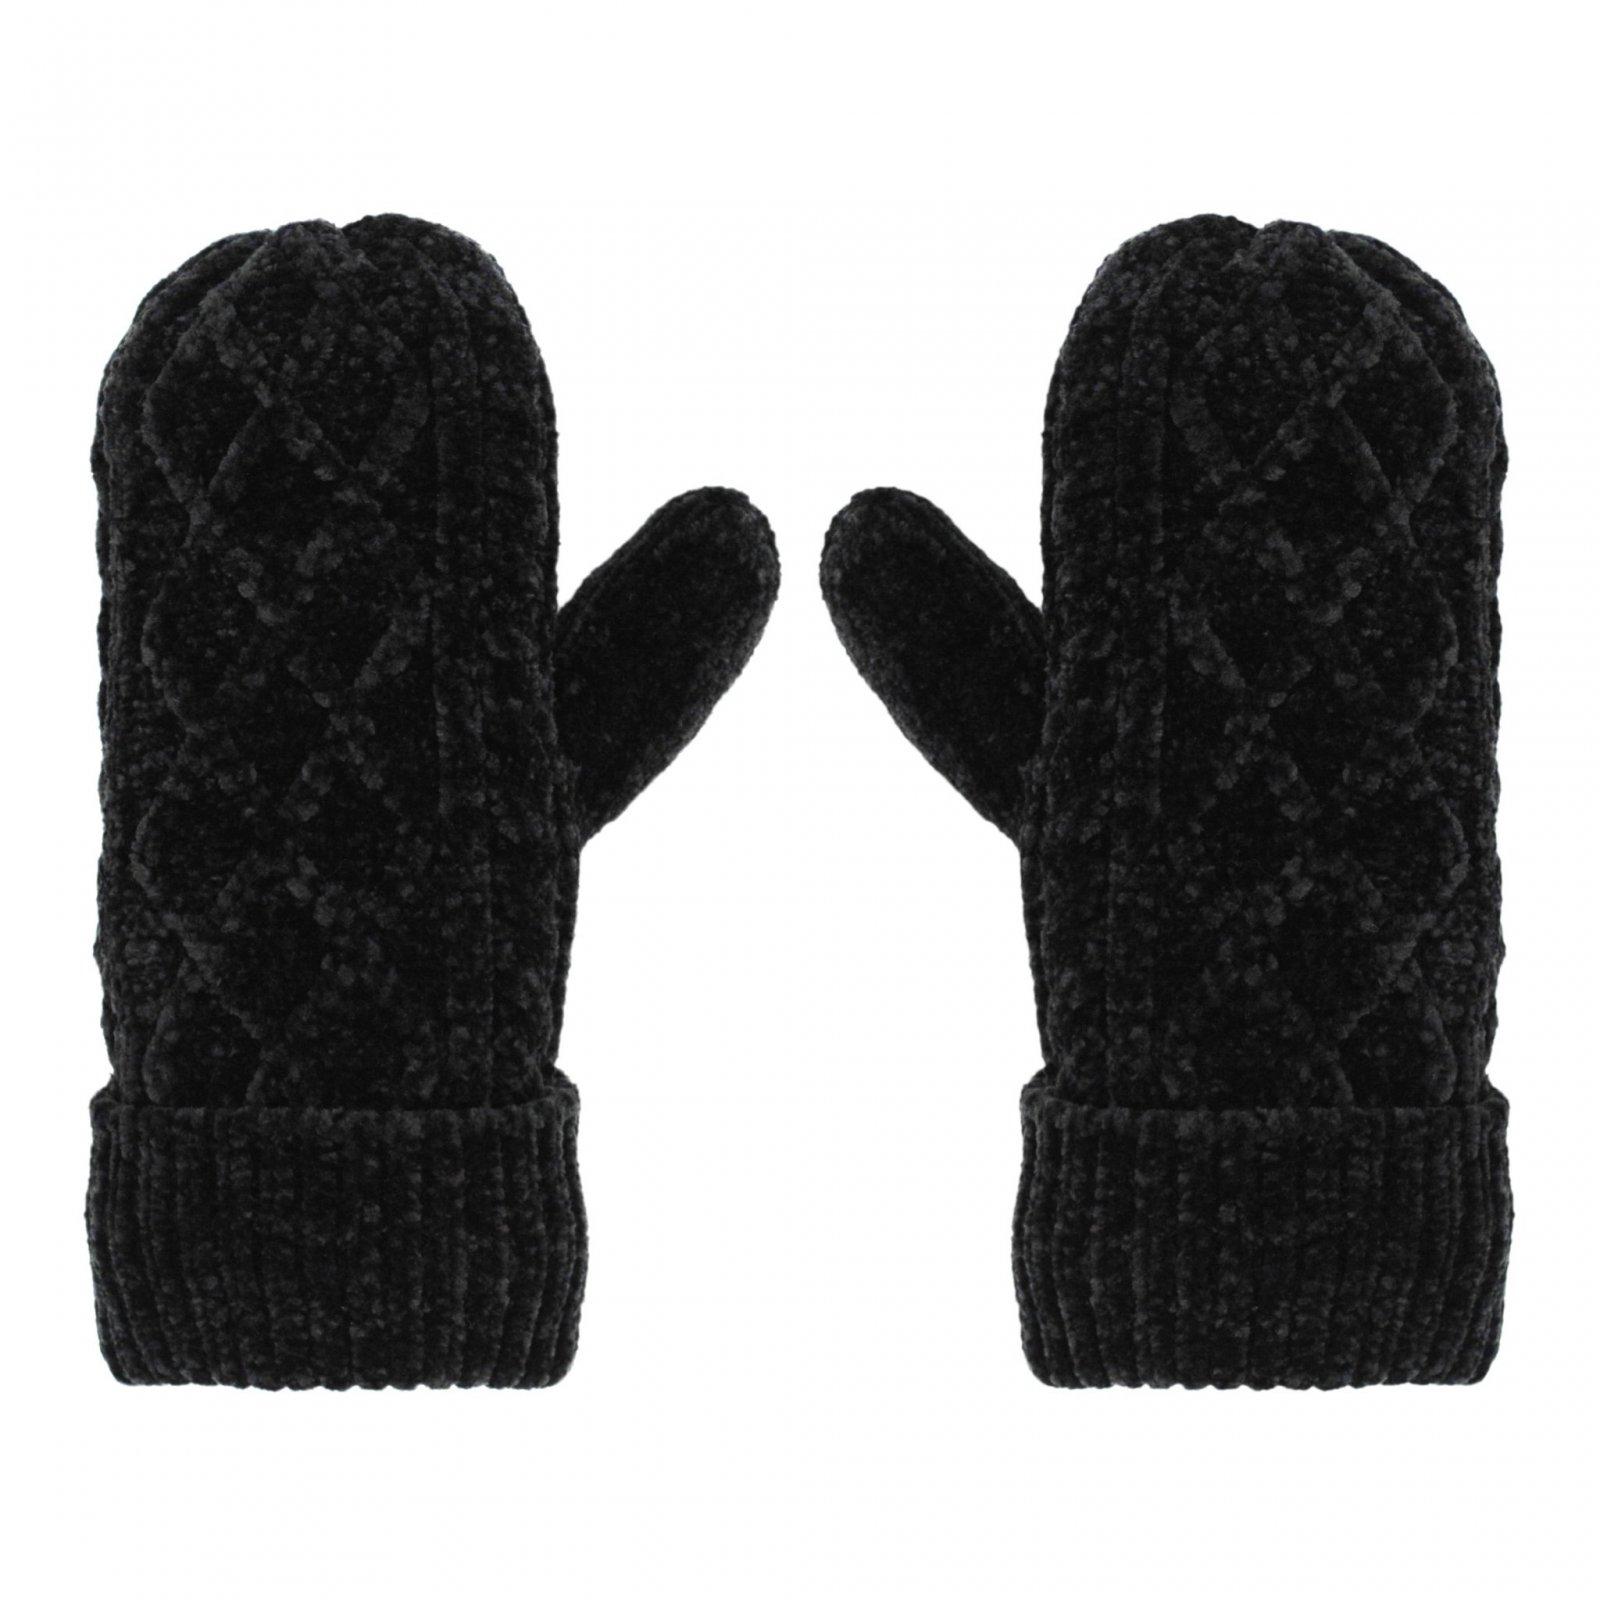 Chenille Knit Mittens | Black